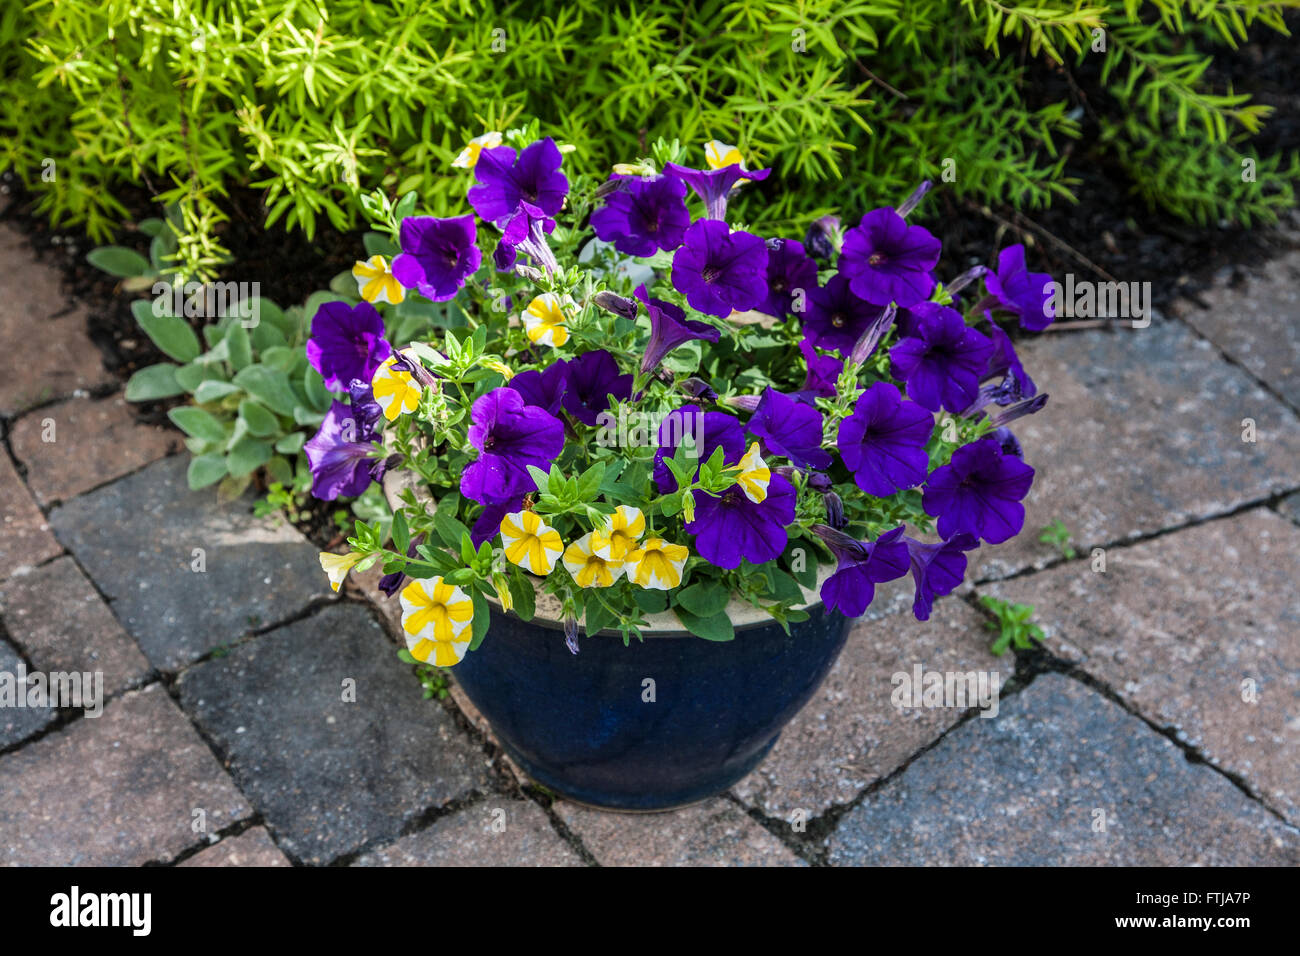 Flower pot of purple and yellow petunia flowers on a brick patio in flower pot of purple and yellow petunia flowers on a brick patio in new jersey usa mightylinksfo